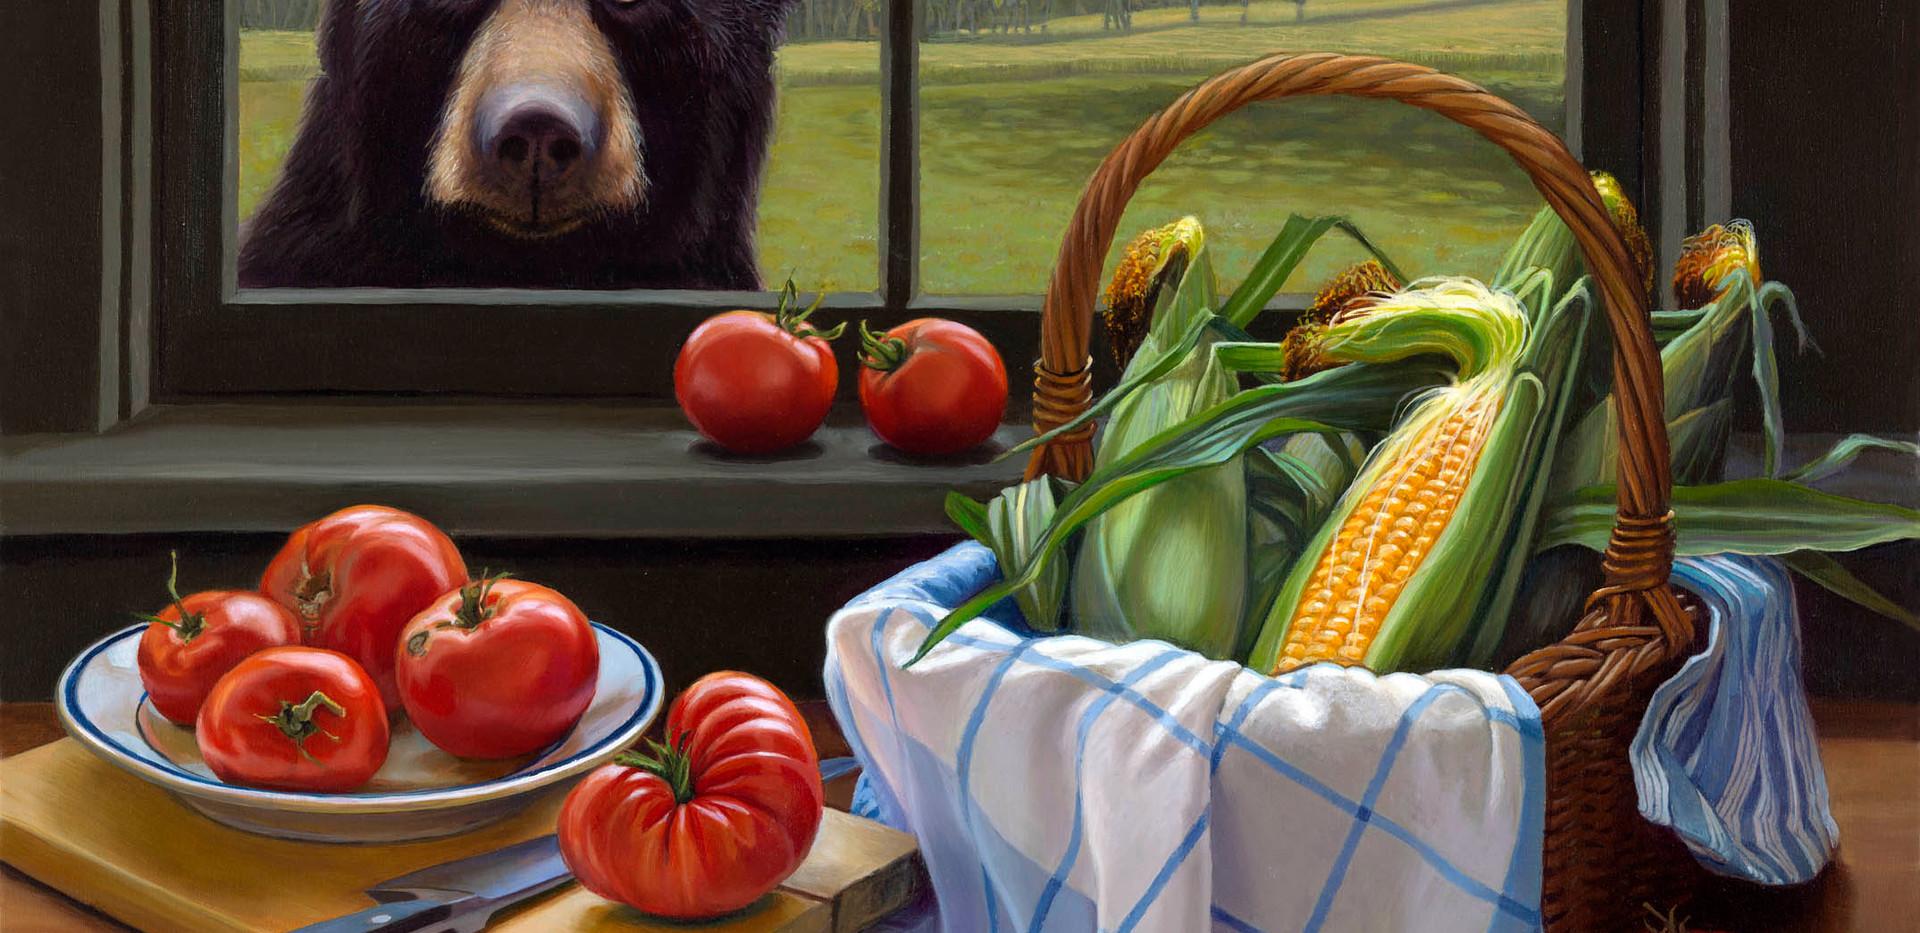 Bear, Corn and Tomatoes